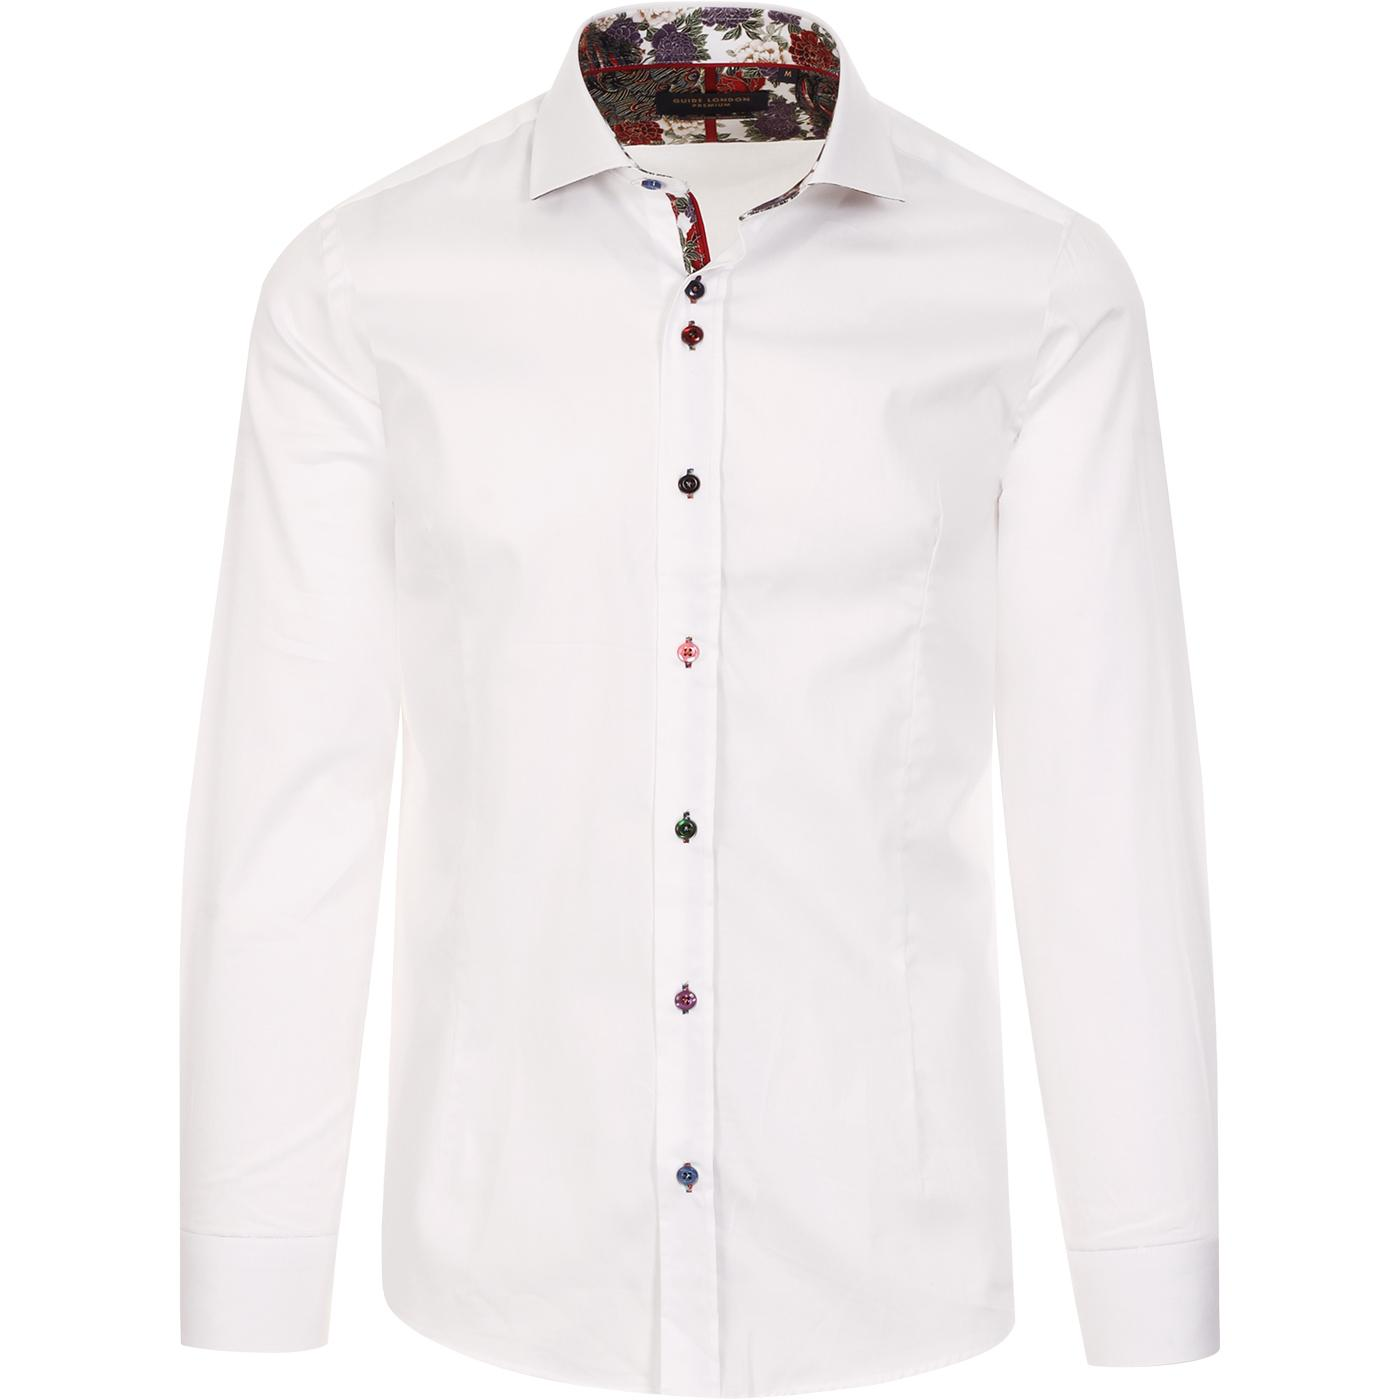 GUIDE LONDON Classic 60s Mod Plain Shirt (White)